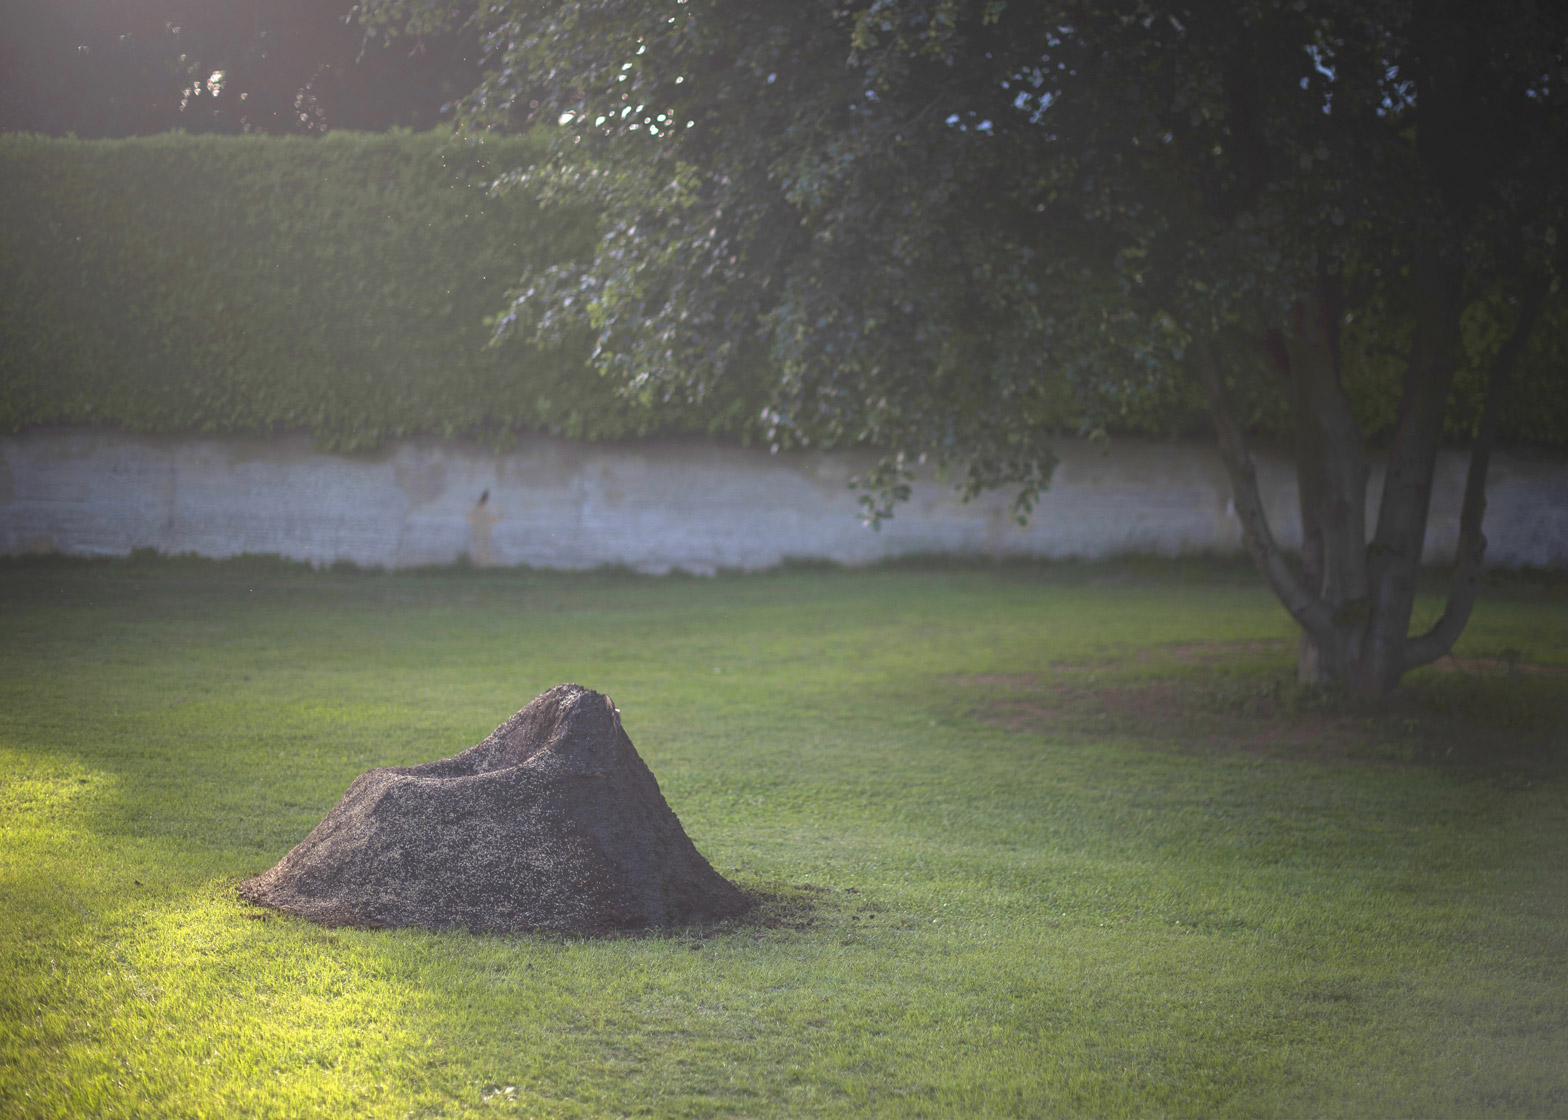 Terra grass chair by Nucleo